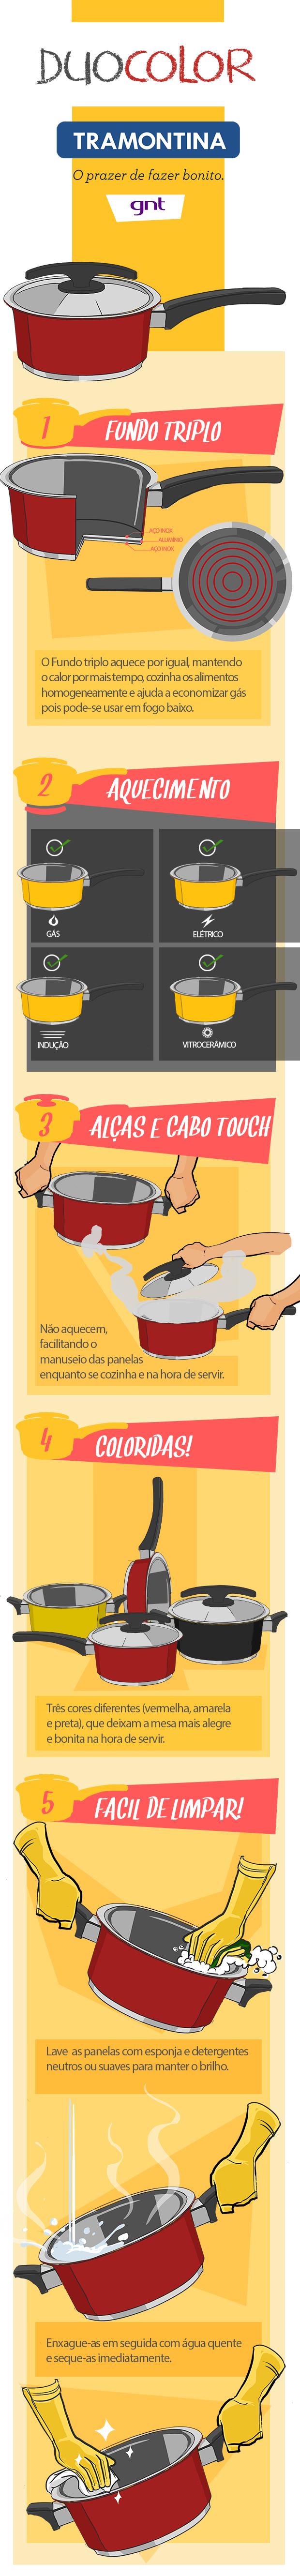 Tramontina: Duocolor (Foto: Divulgao/Tramontina)